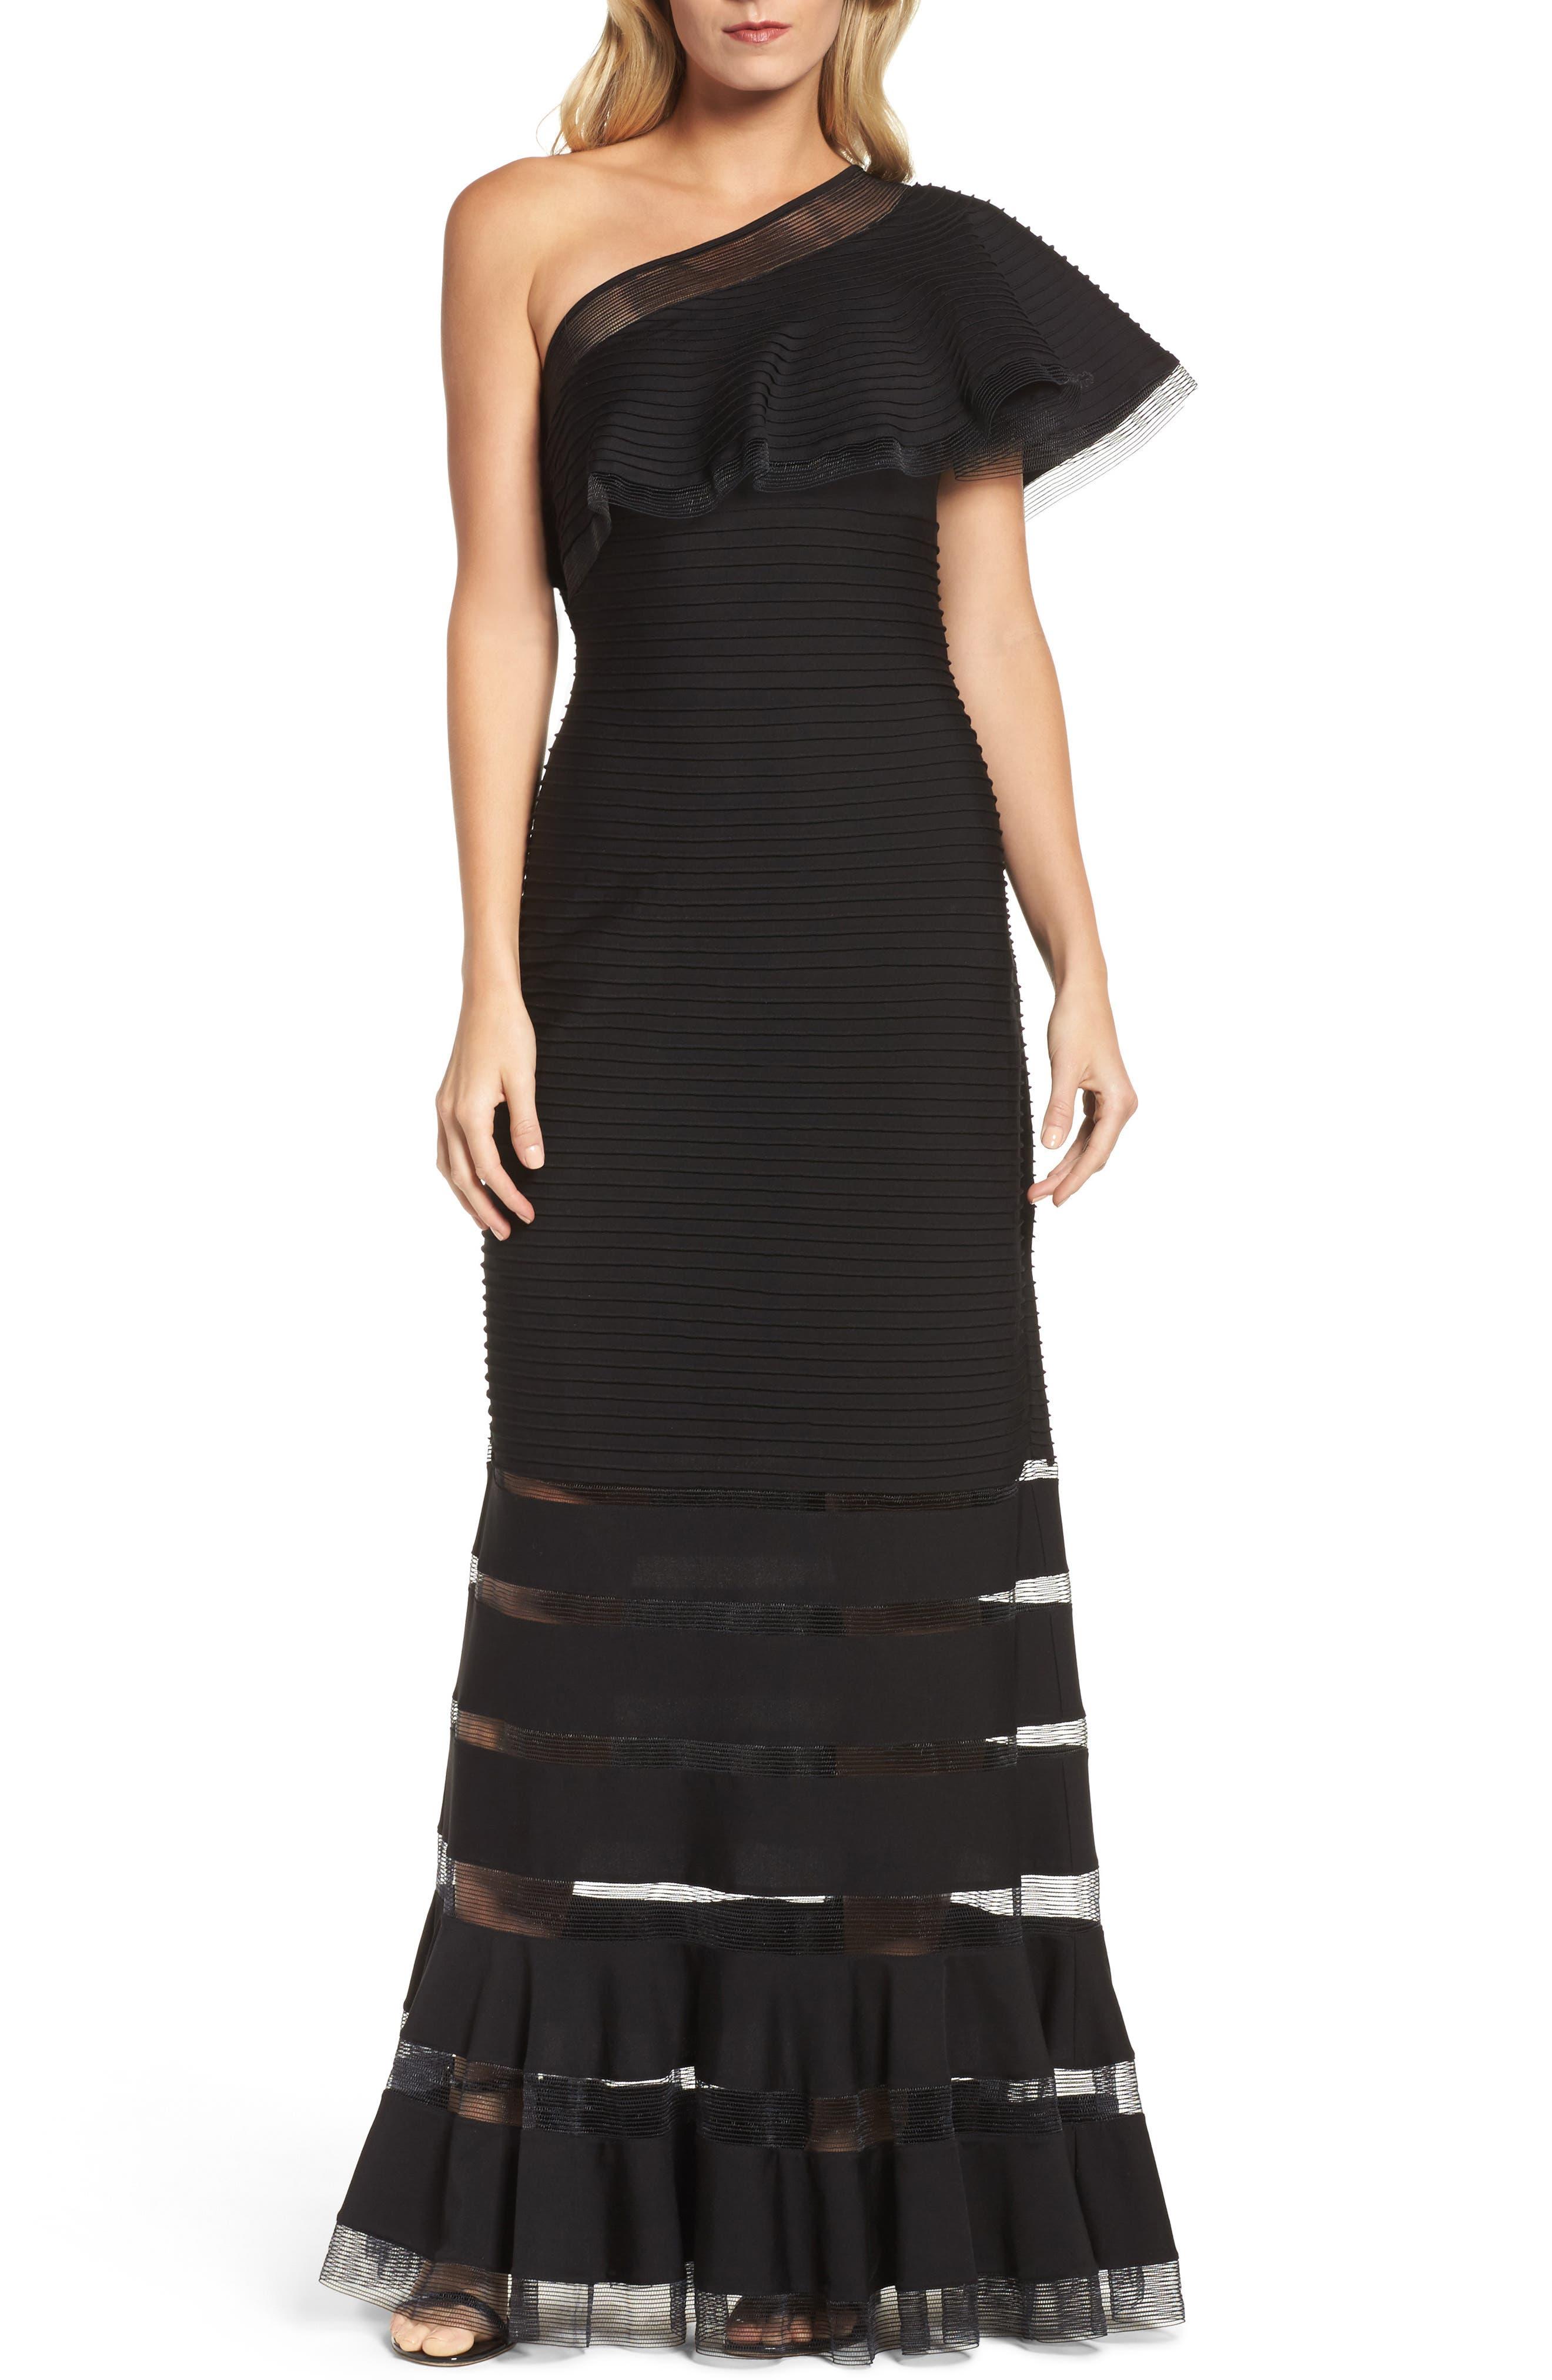 Alternate Image 1 Selected - Tadashi Shoji Pintuck One-Shoulder Gown (Regular & Petite)